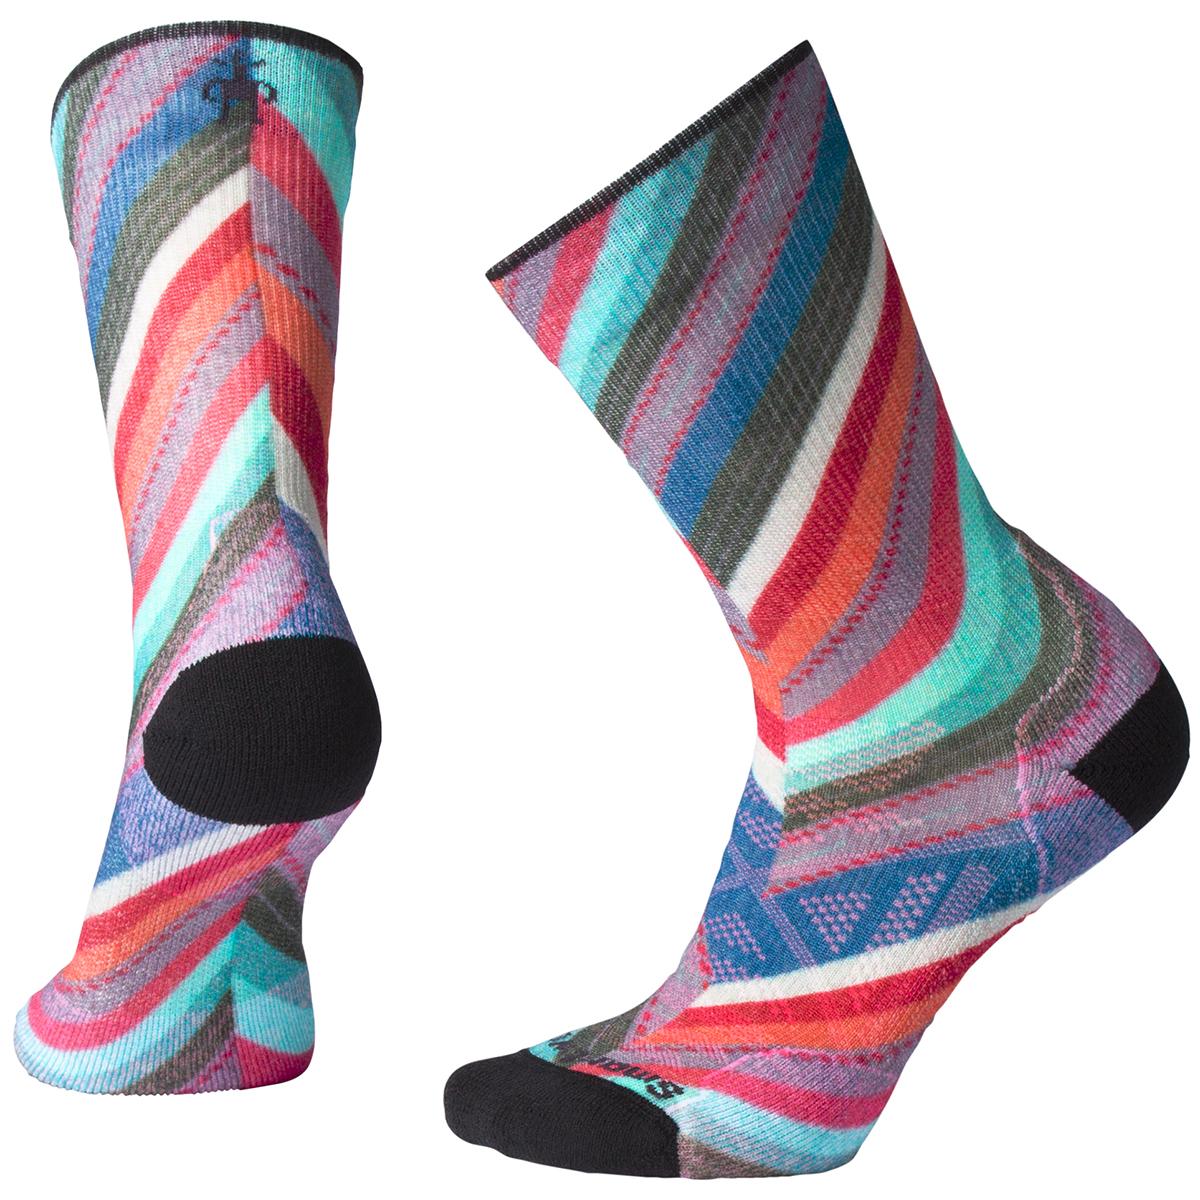 Smartwool Women's Phd Outdoor Light Print Crew Socks - Various Patterns, M